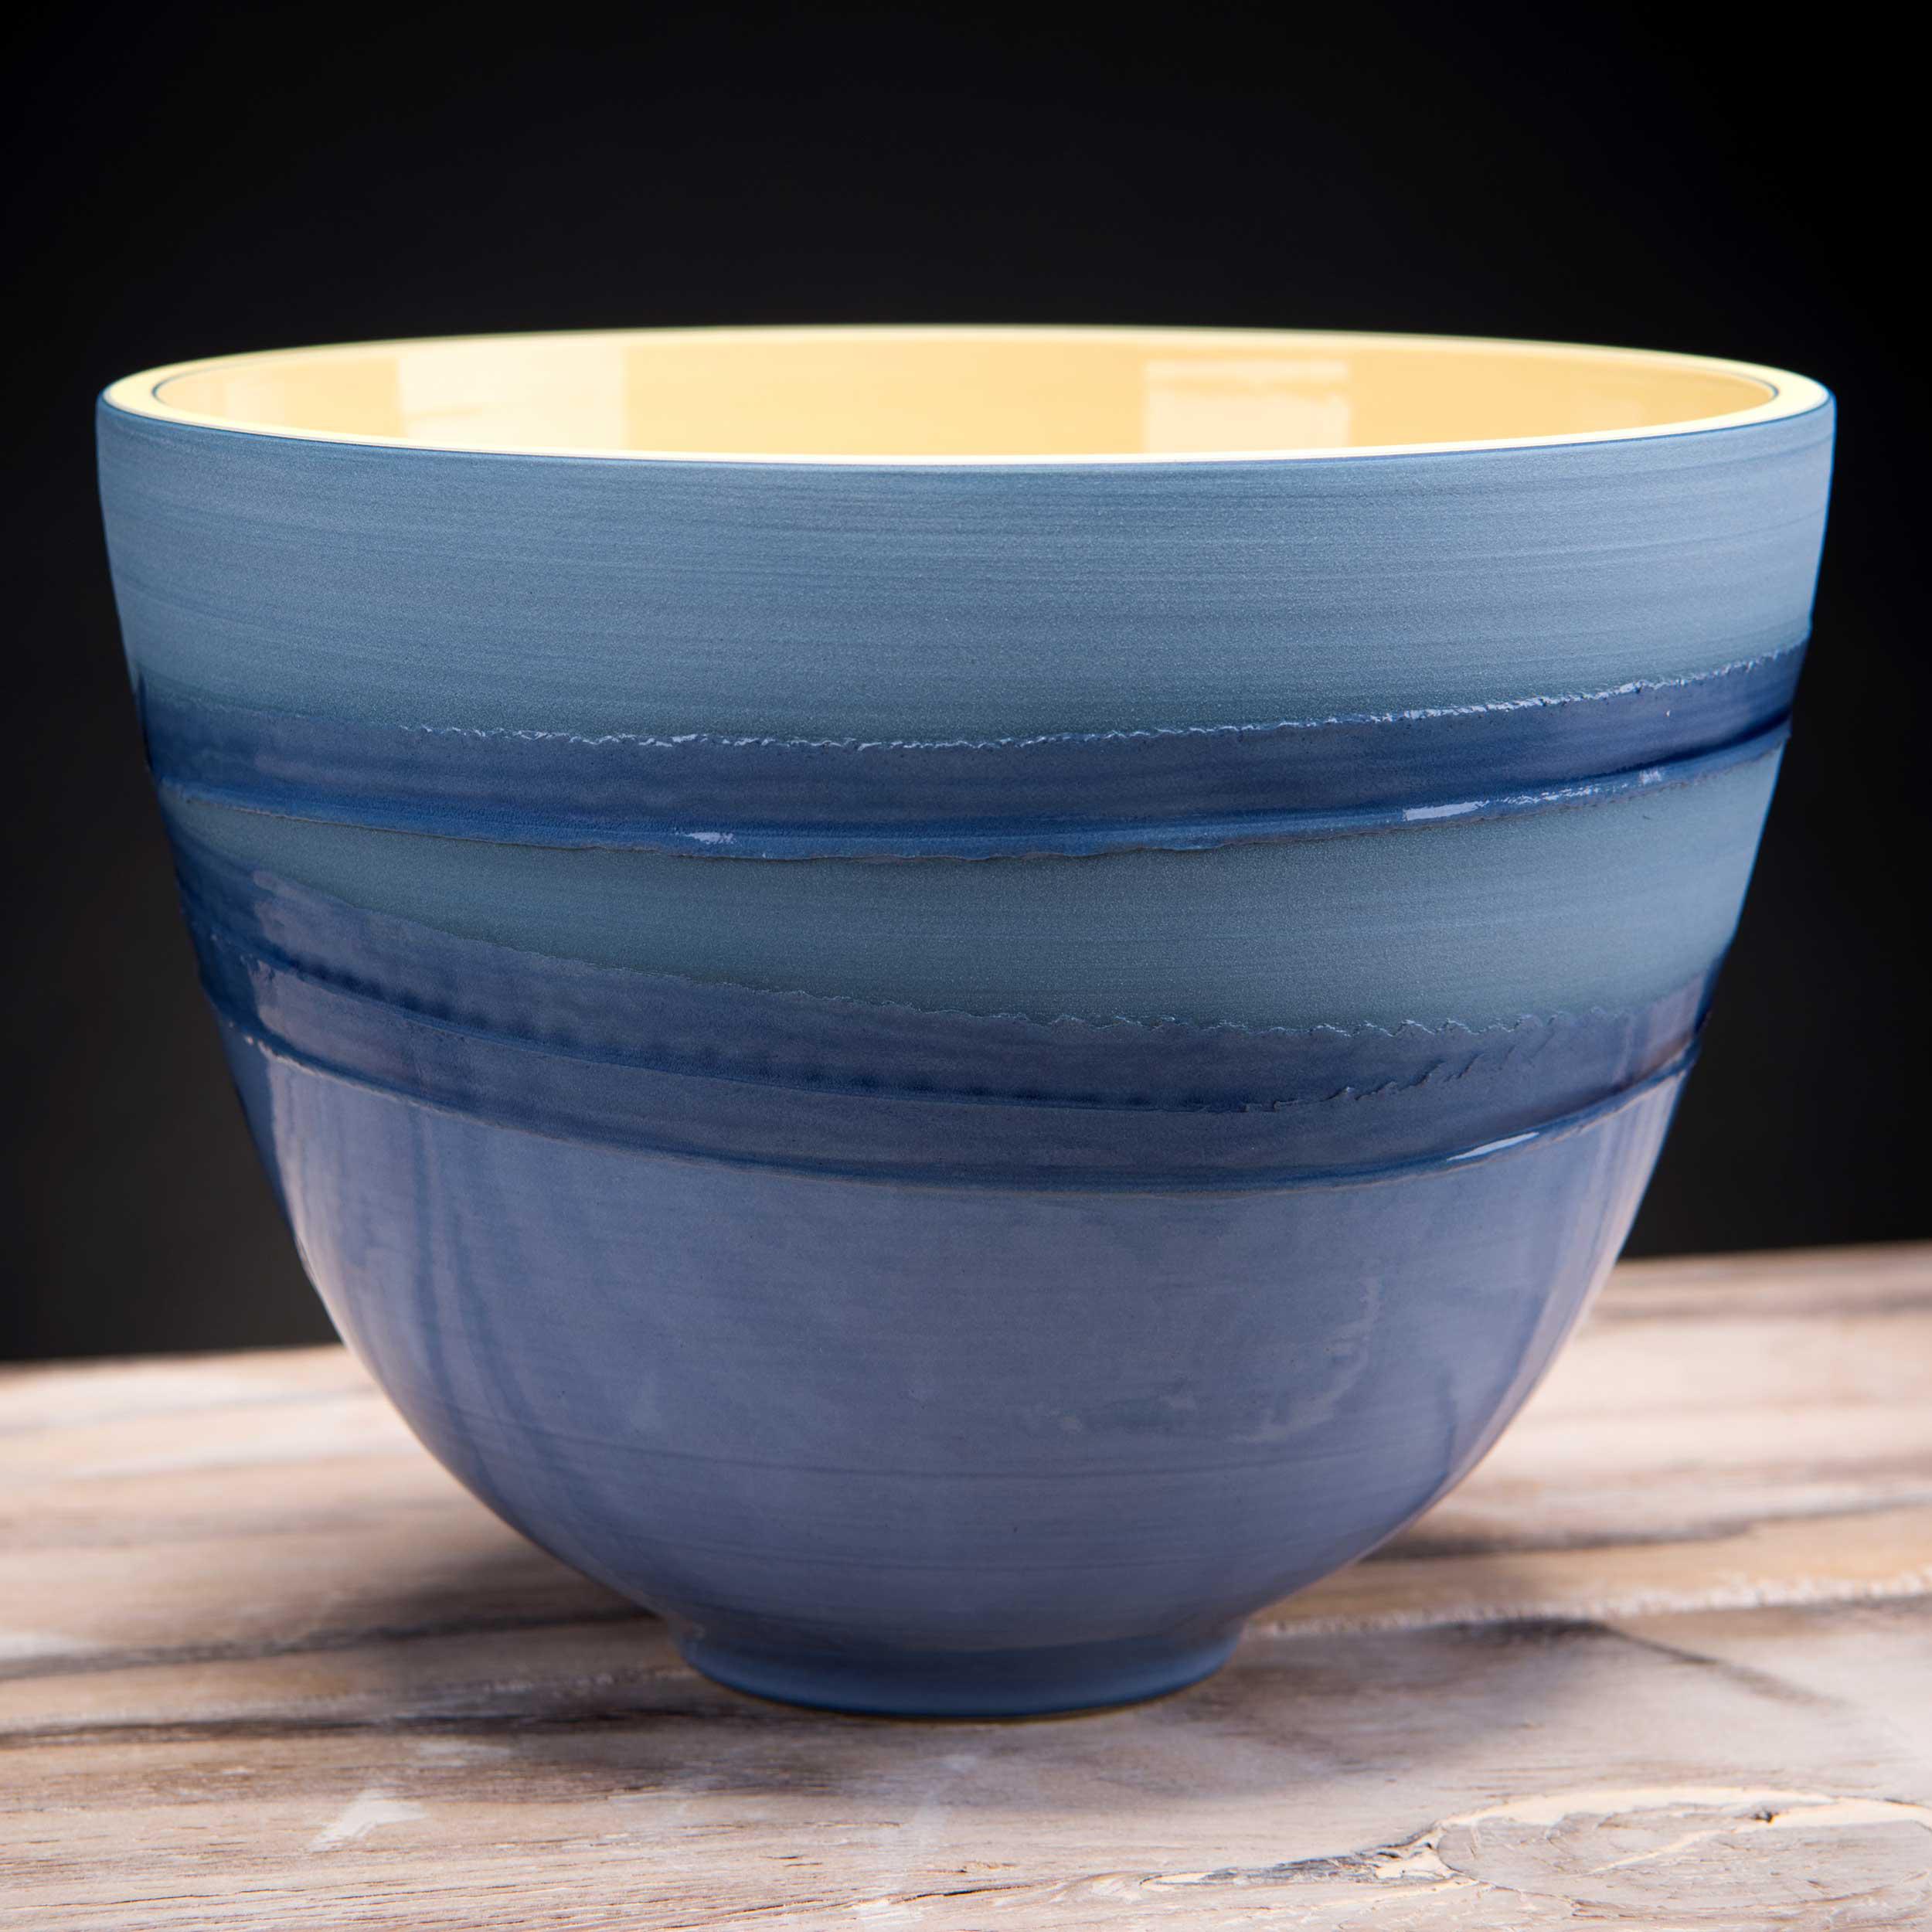 Deep Ceramic Bowl Blue Water Sea Design by Rowena Gilbert